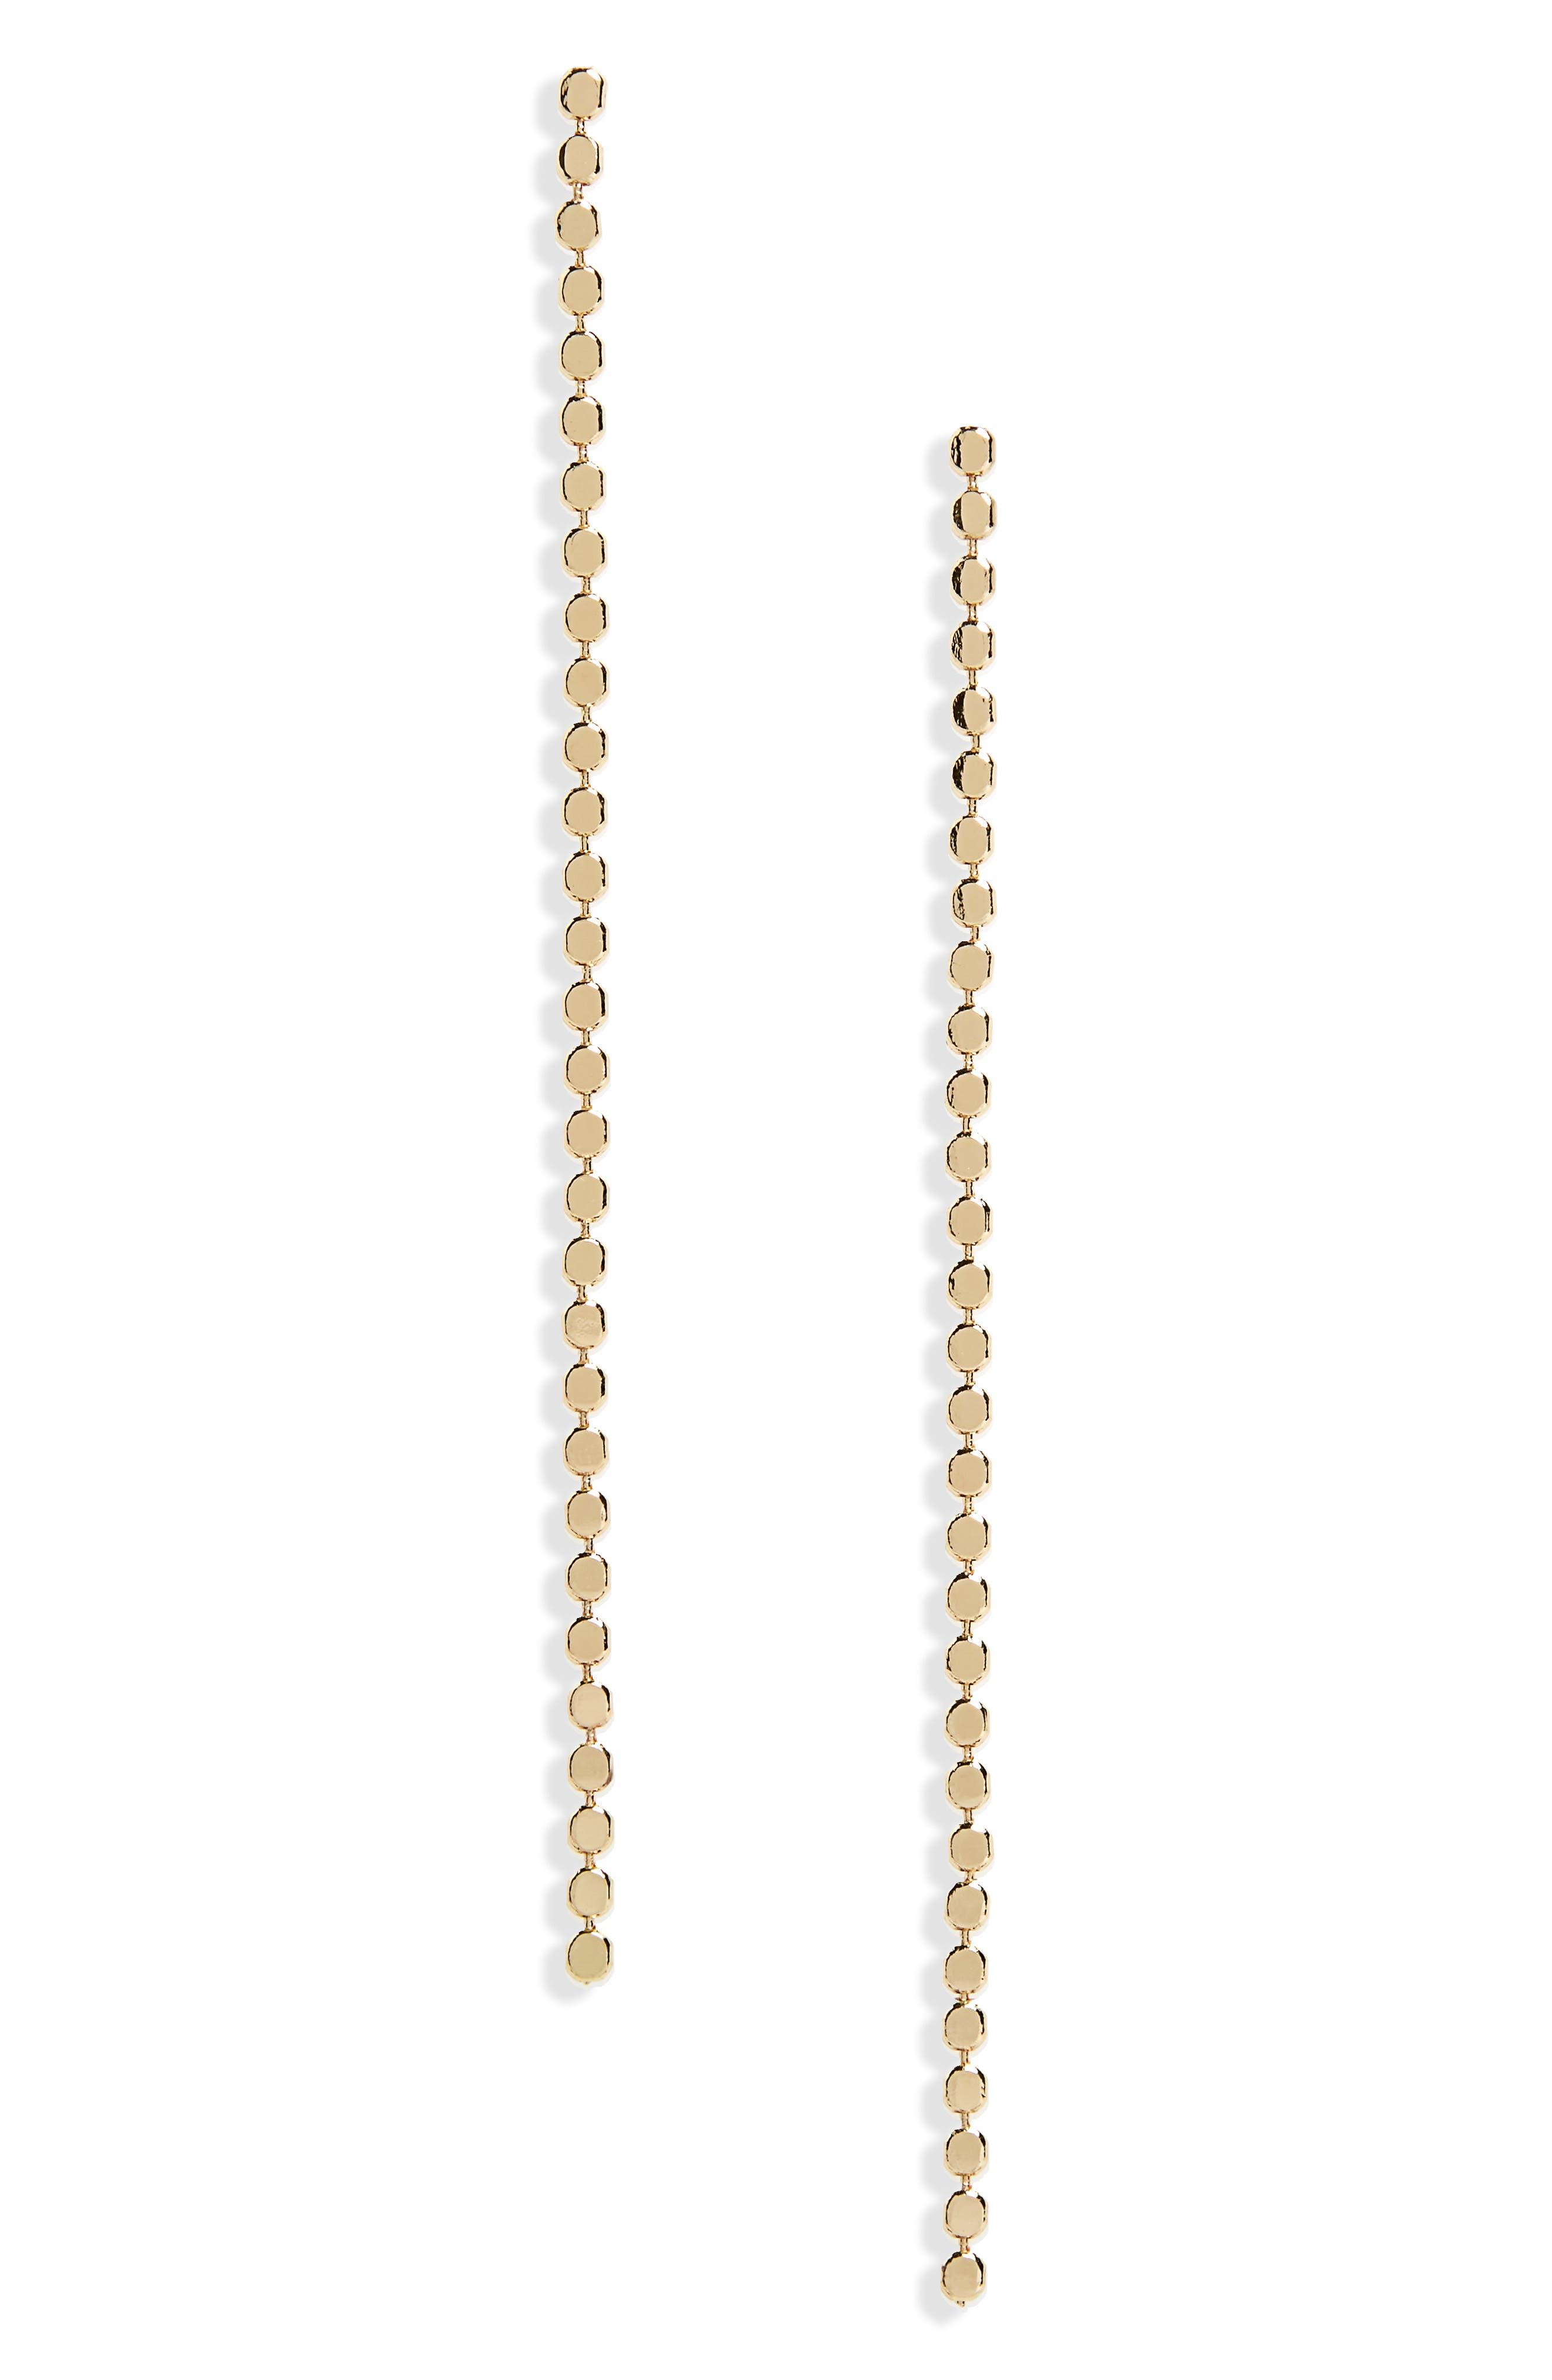 Dainty Drop Earrings,                             Main thumbnail 1, color,                             710